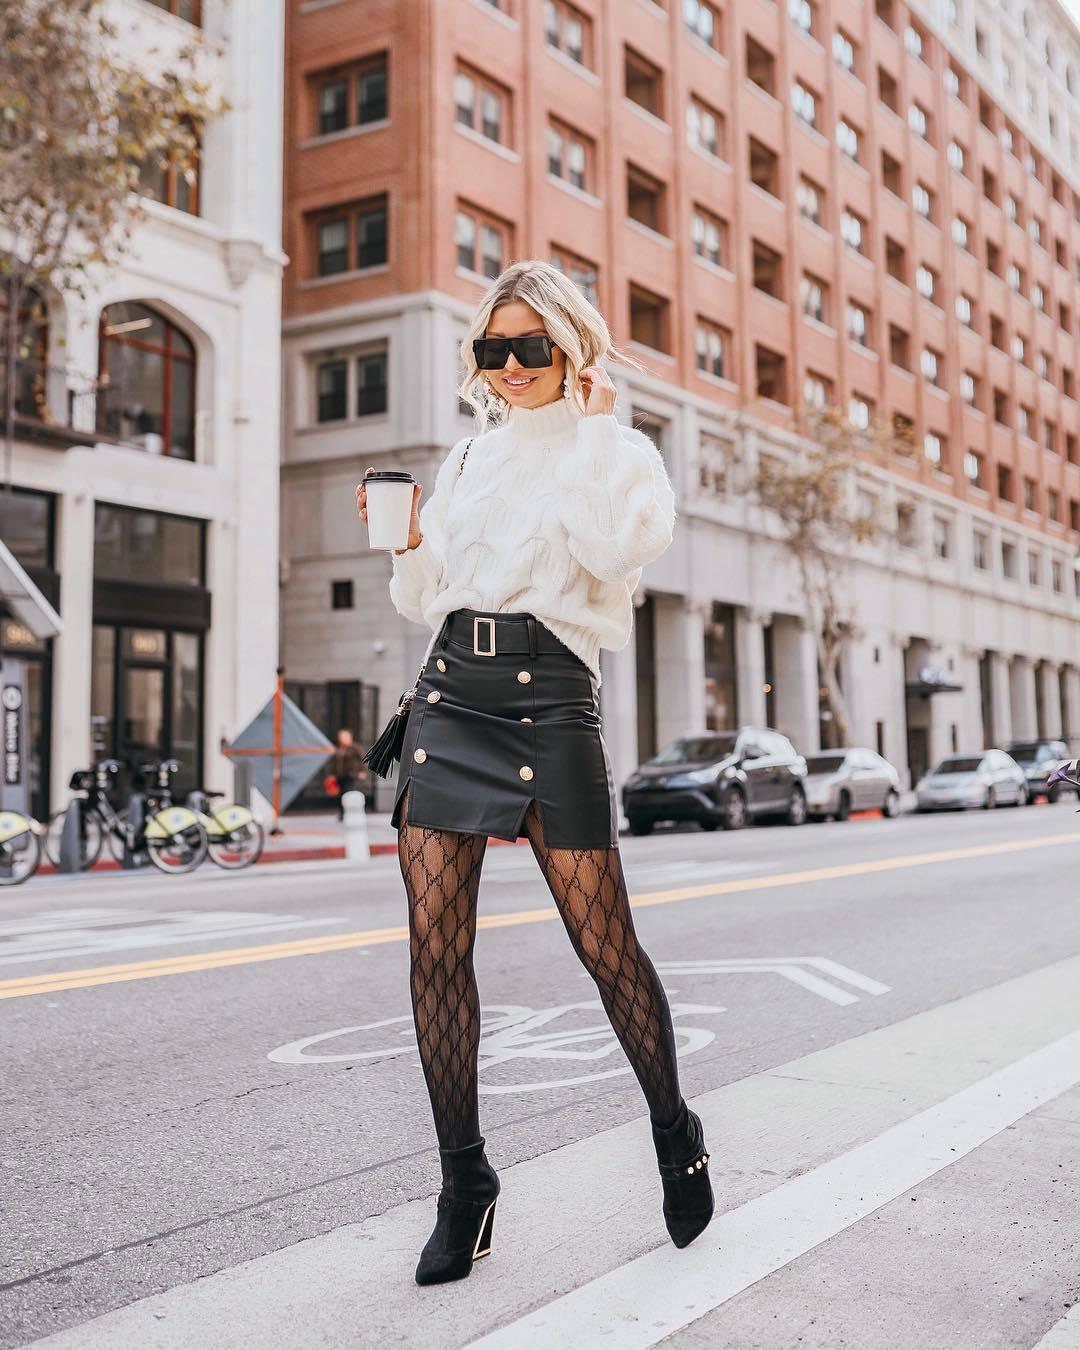 skirt black skirt slit skirt black boots platform boots tights white sweater turtleneck sweater black bag leather skirt